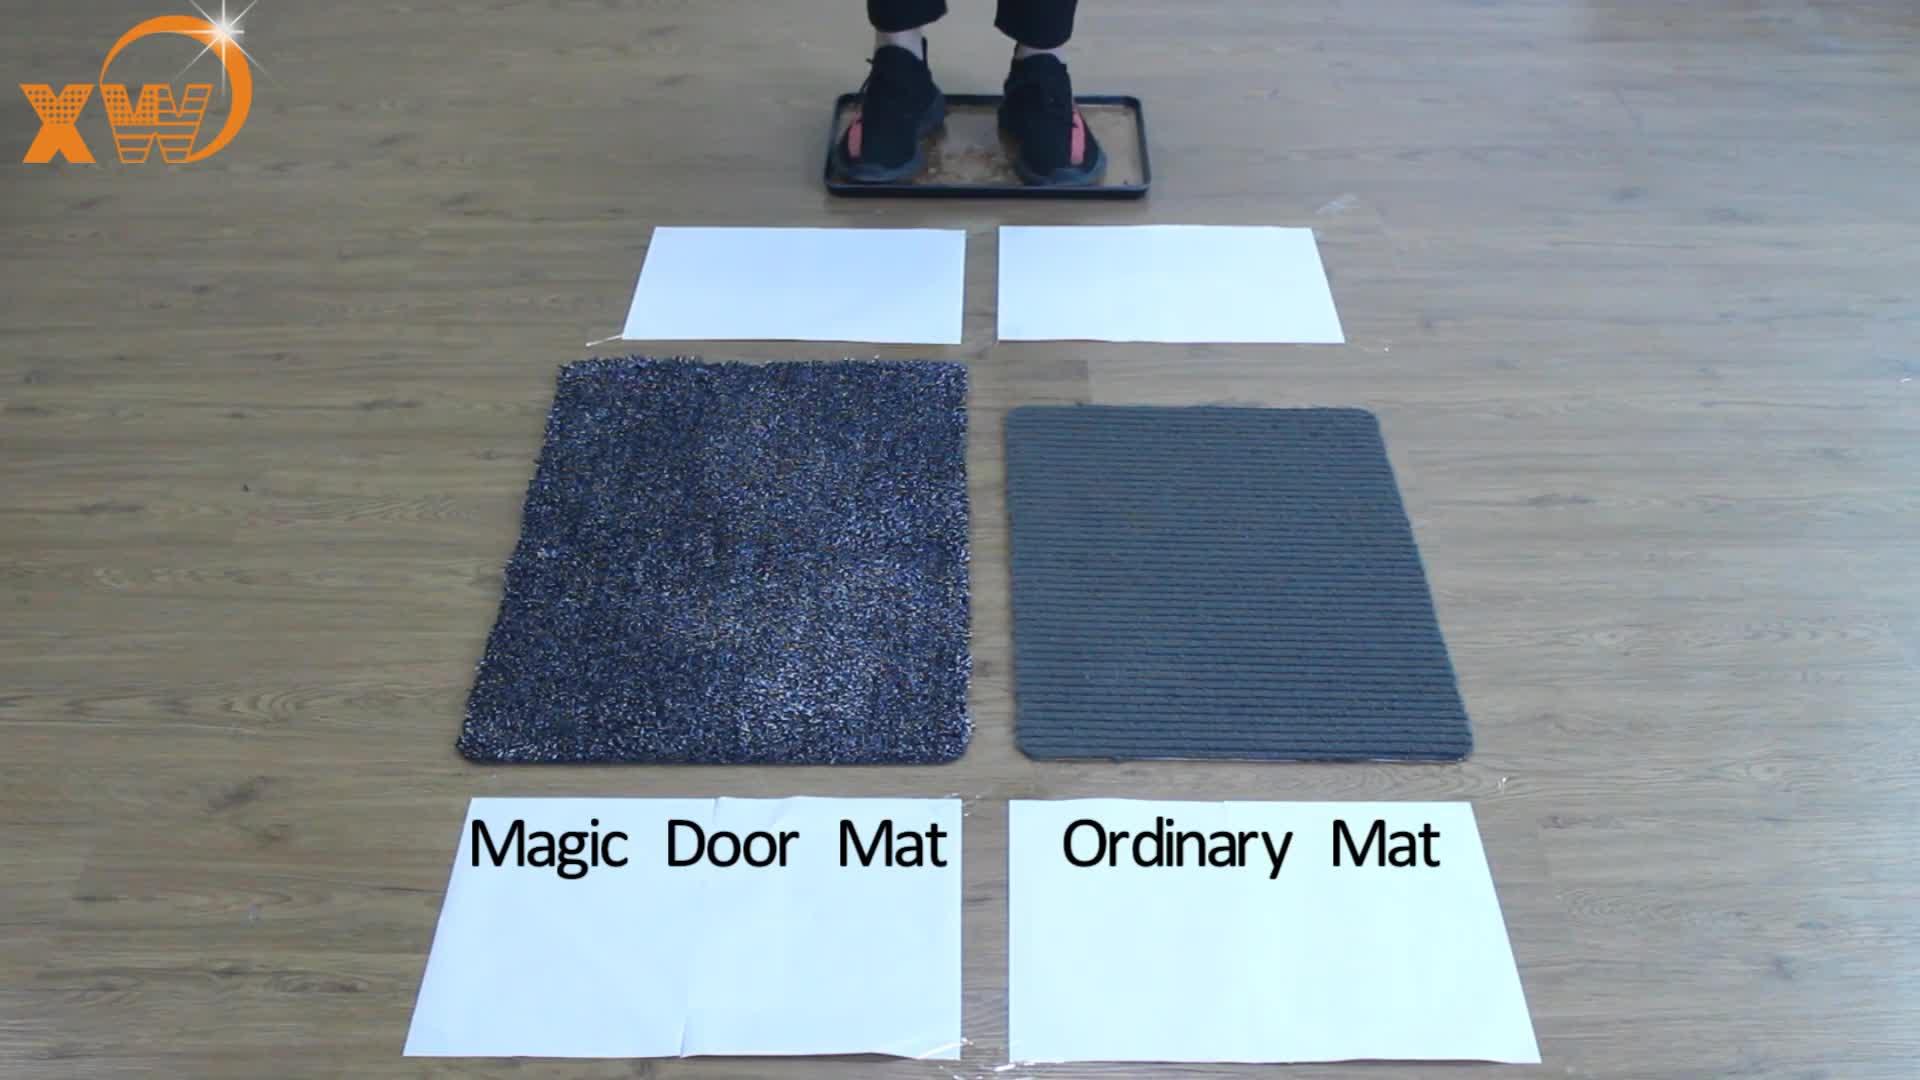 Puerta diseño felpudo super absorbe barro antideslizante puerta mágica mat